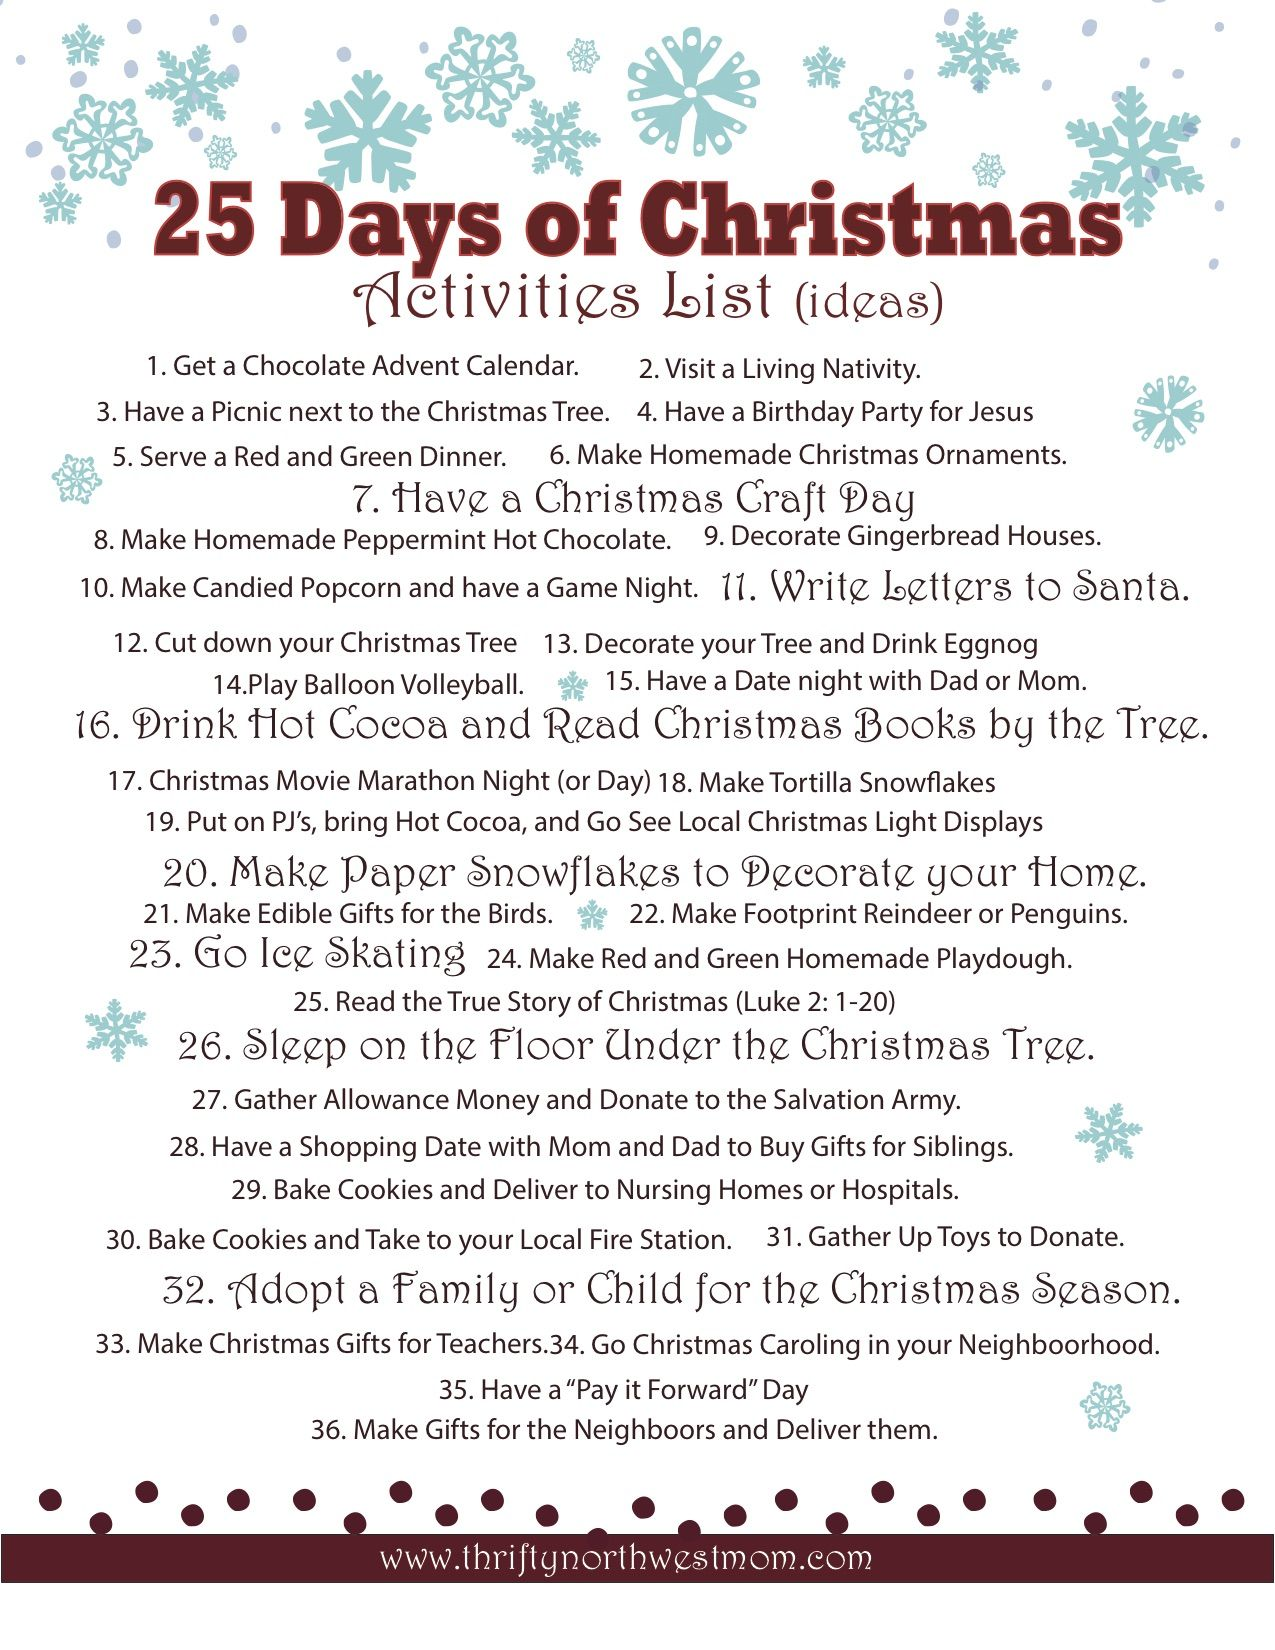 25 Days Of Christmas Activities List Free Printables